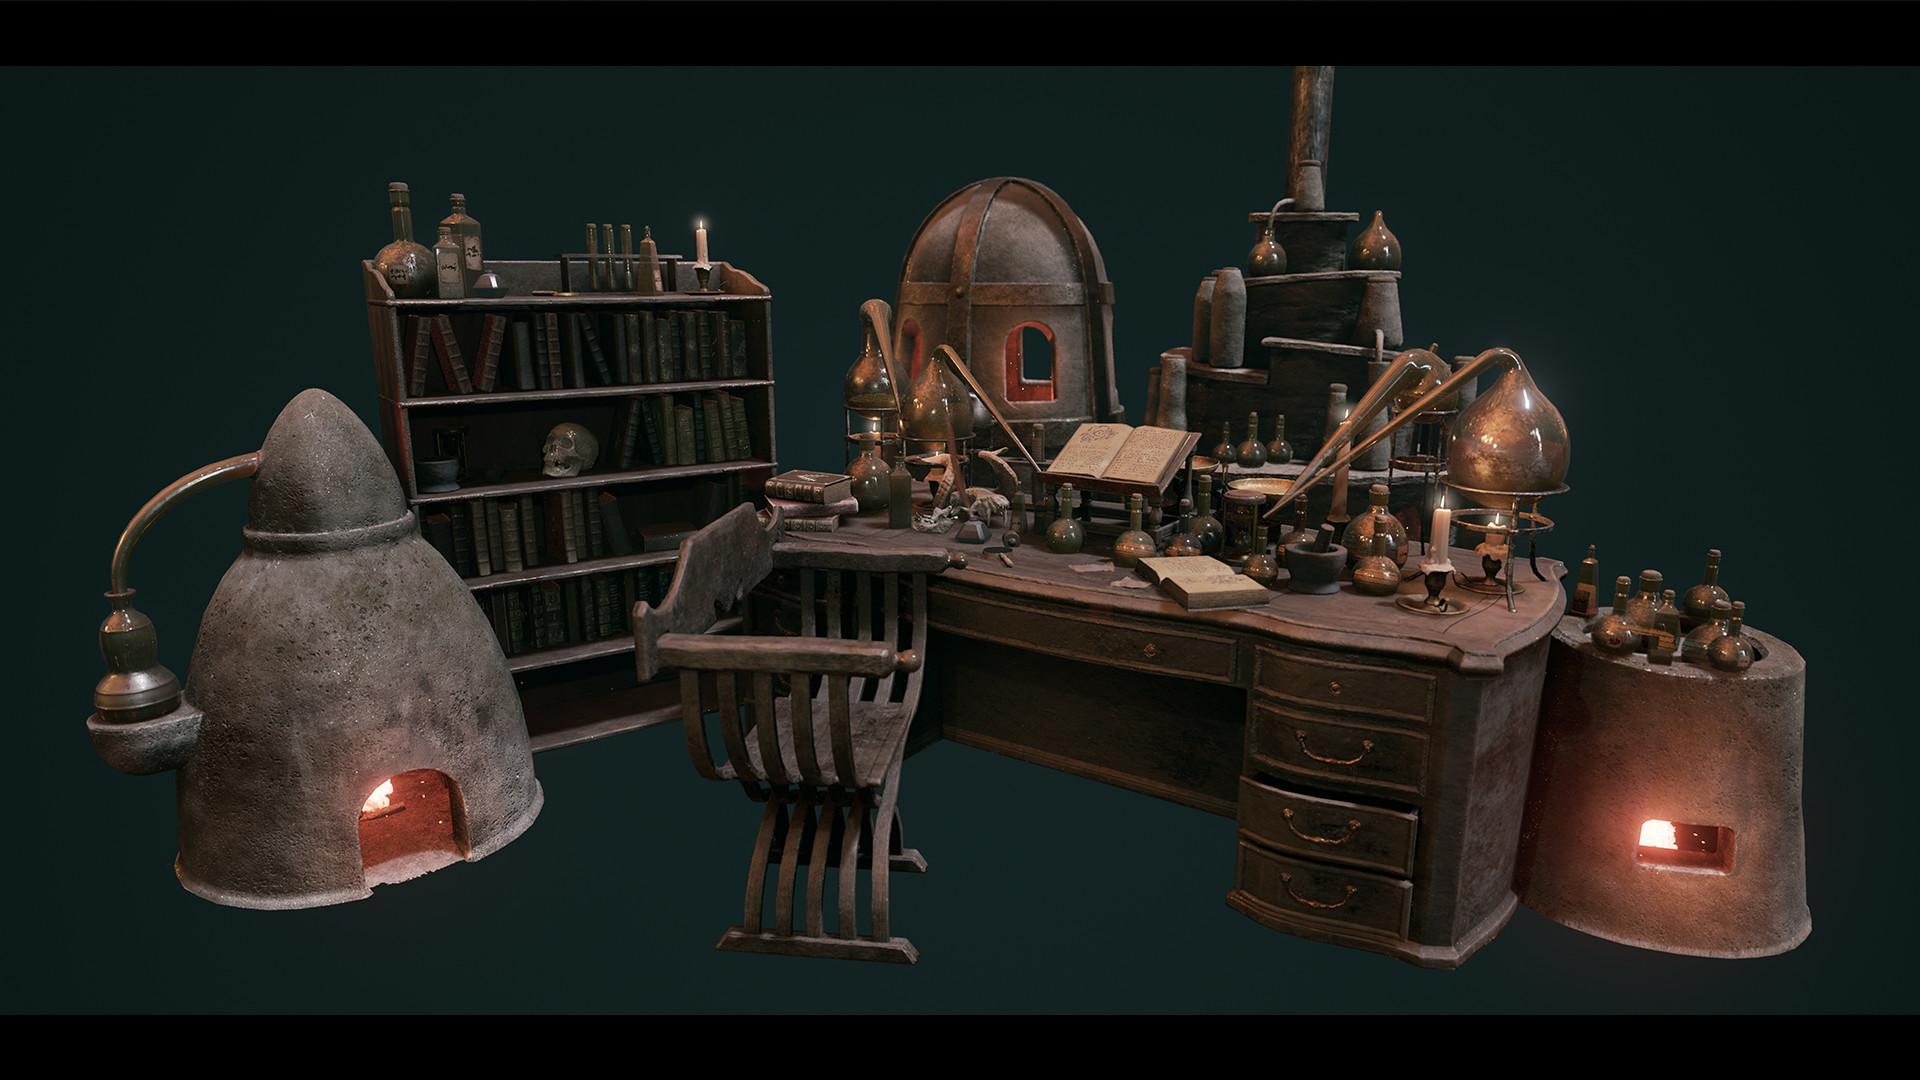 Marco maria rossi store oldalchemist screenshot 1